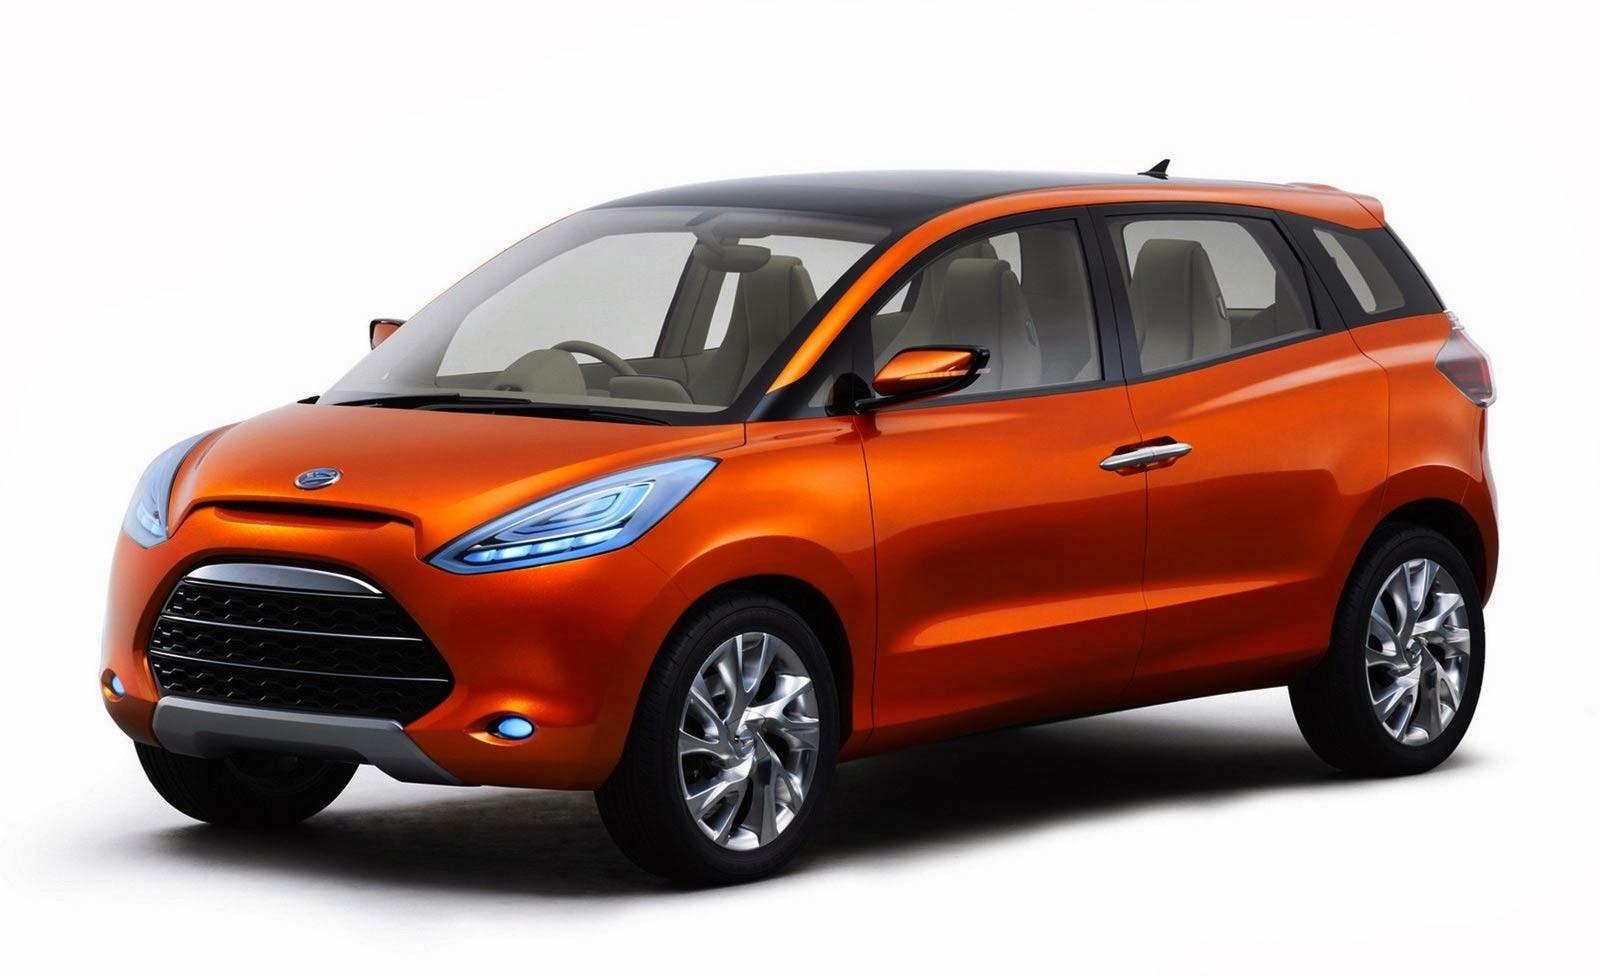 HARGA AVANZA 2014 Terbaru Harga Toyota Avanza Fortuner